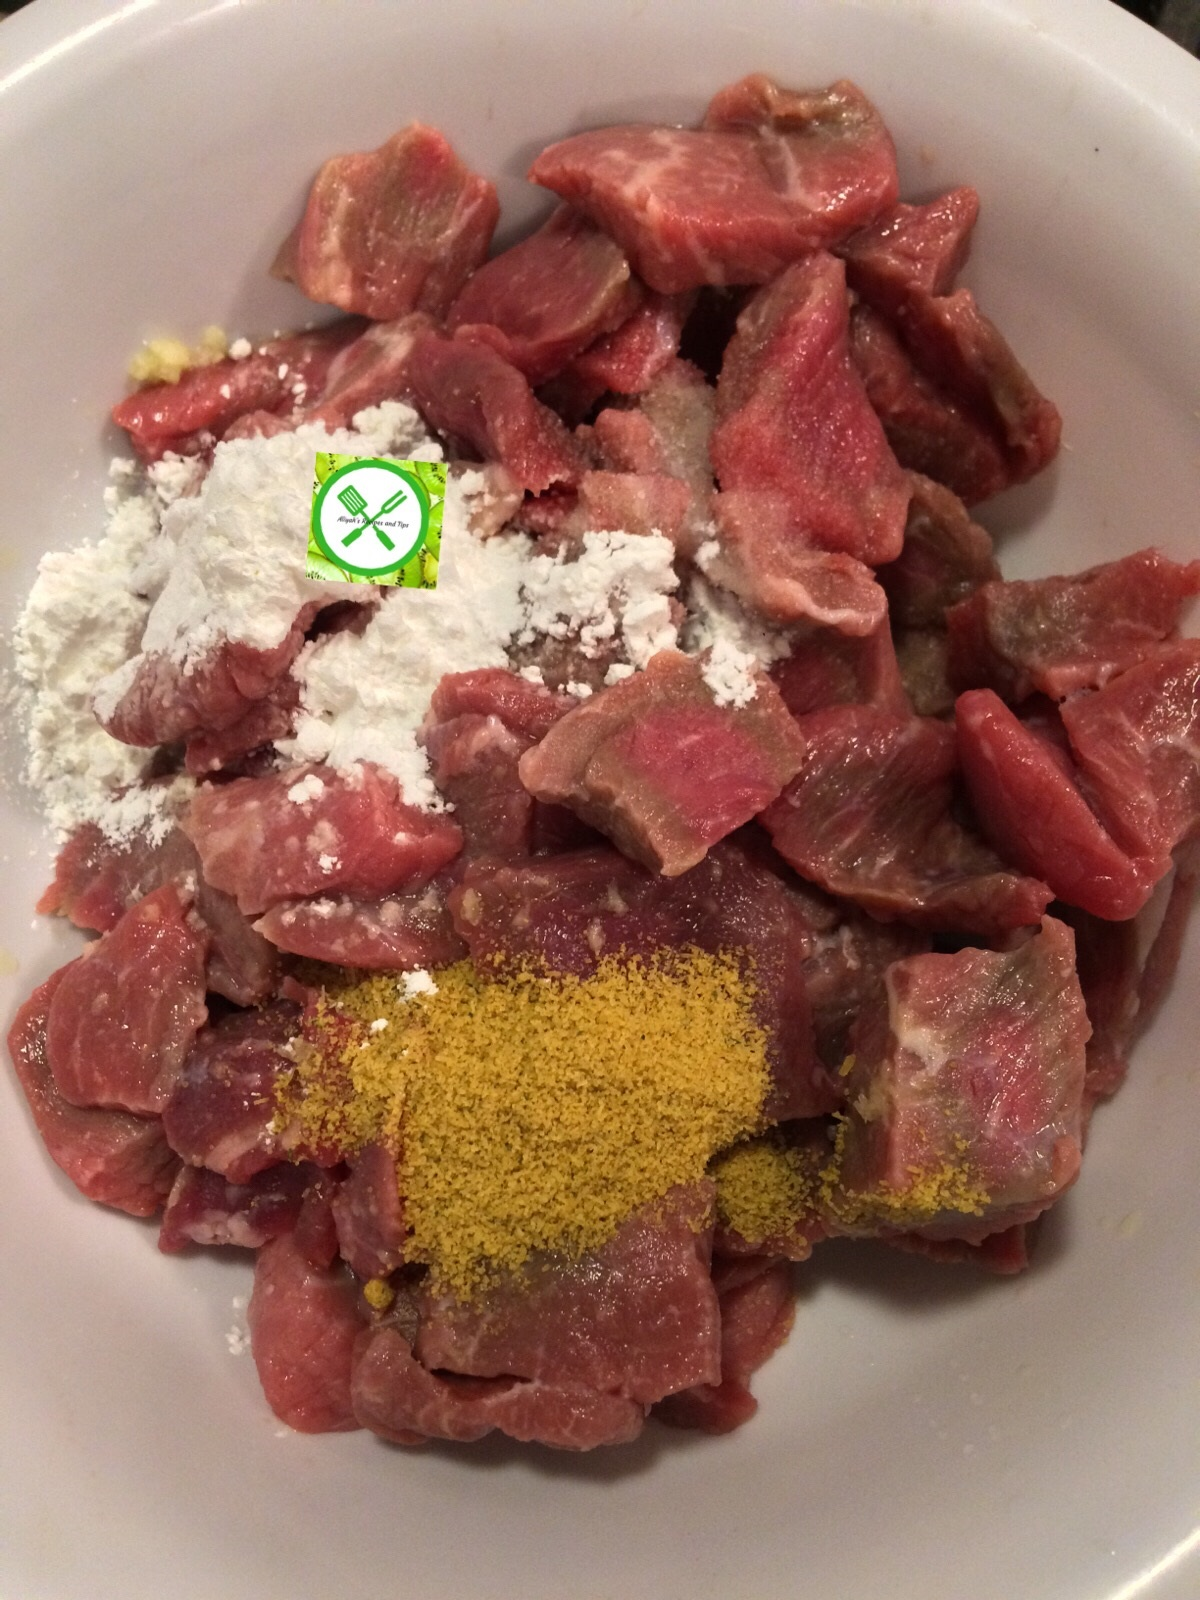 Easy beef and broccoli add seasoning